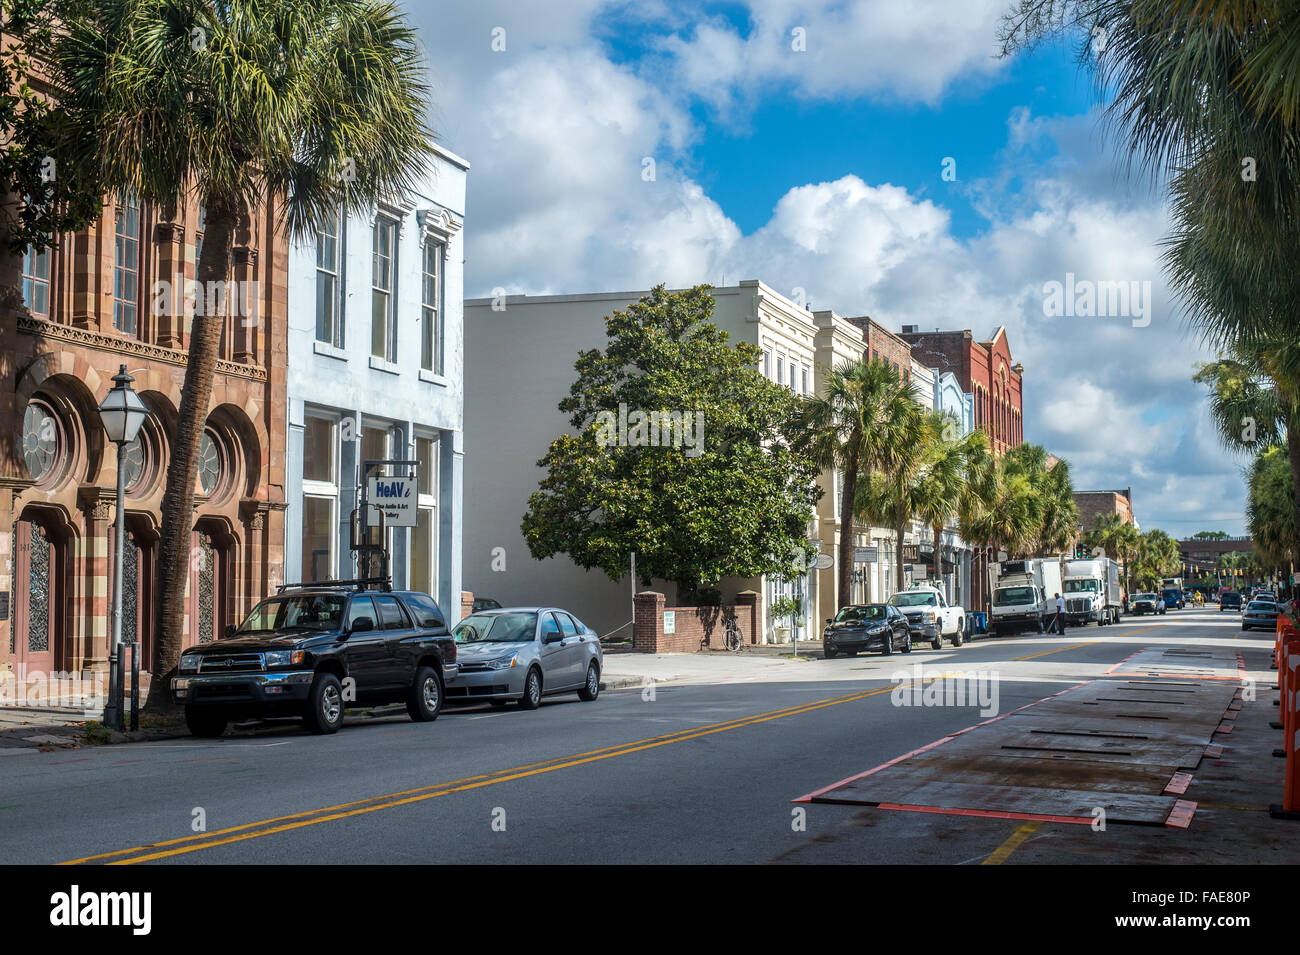 Street view in Charleston, South Carolina - Stock Image